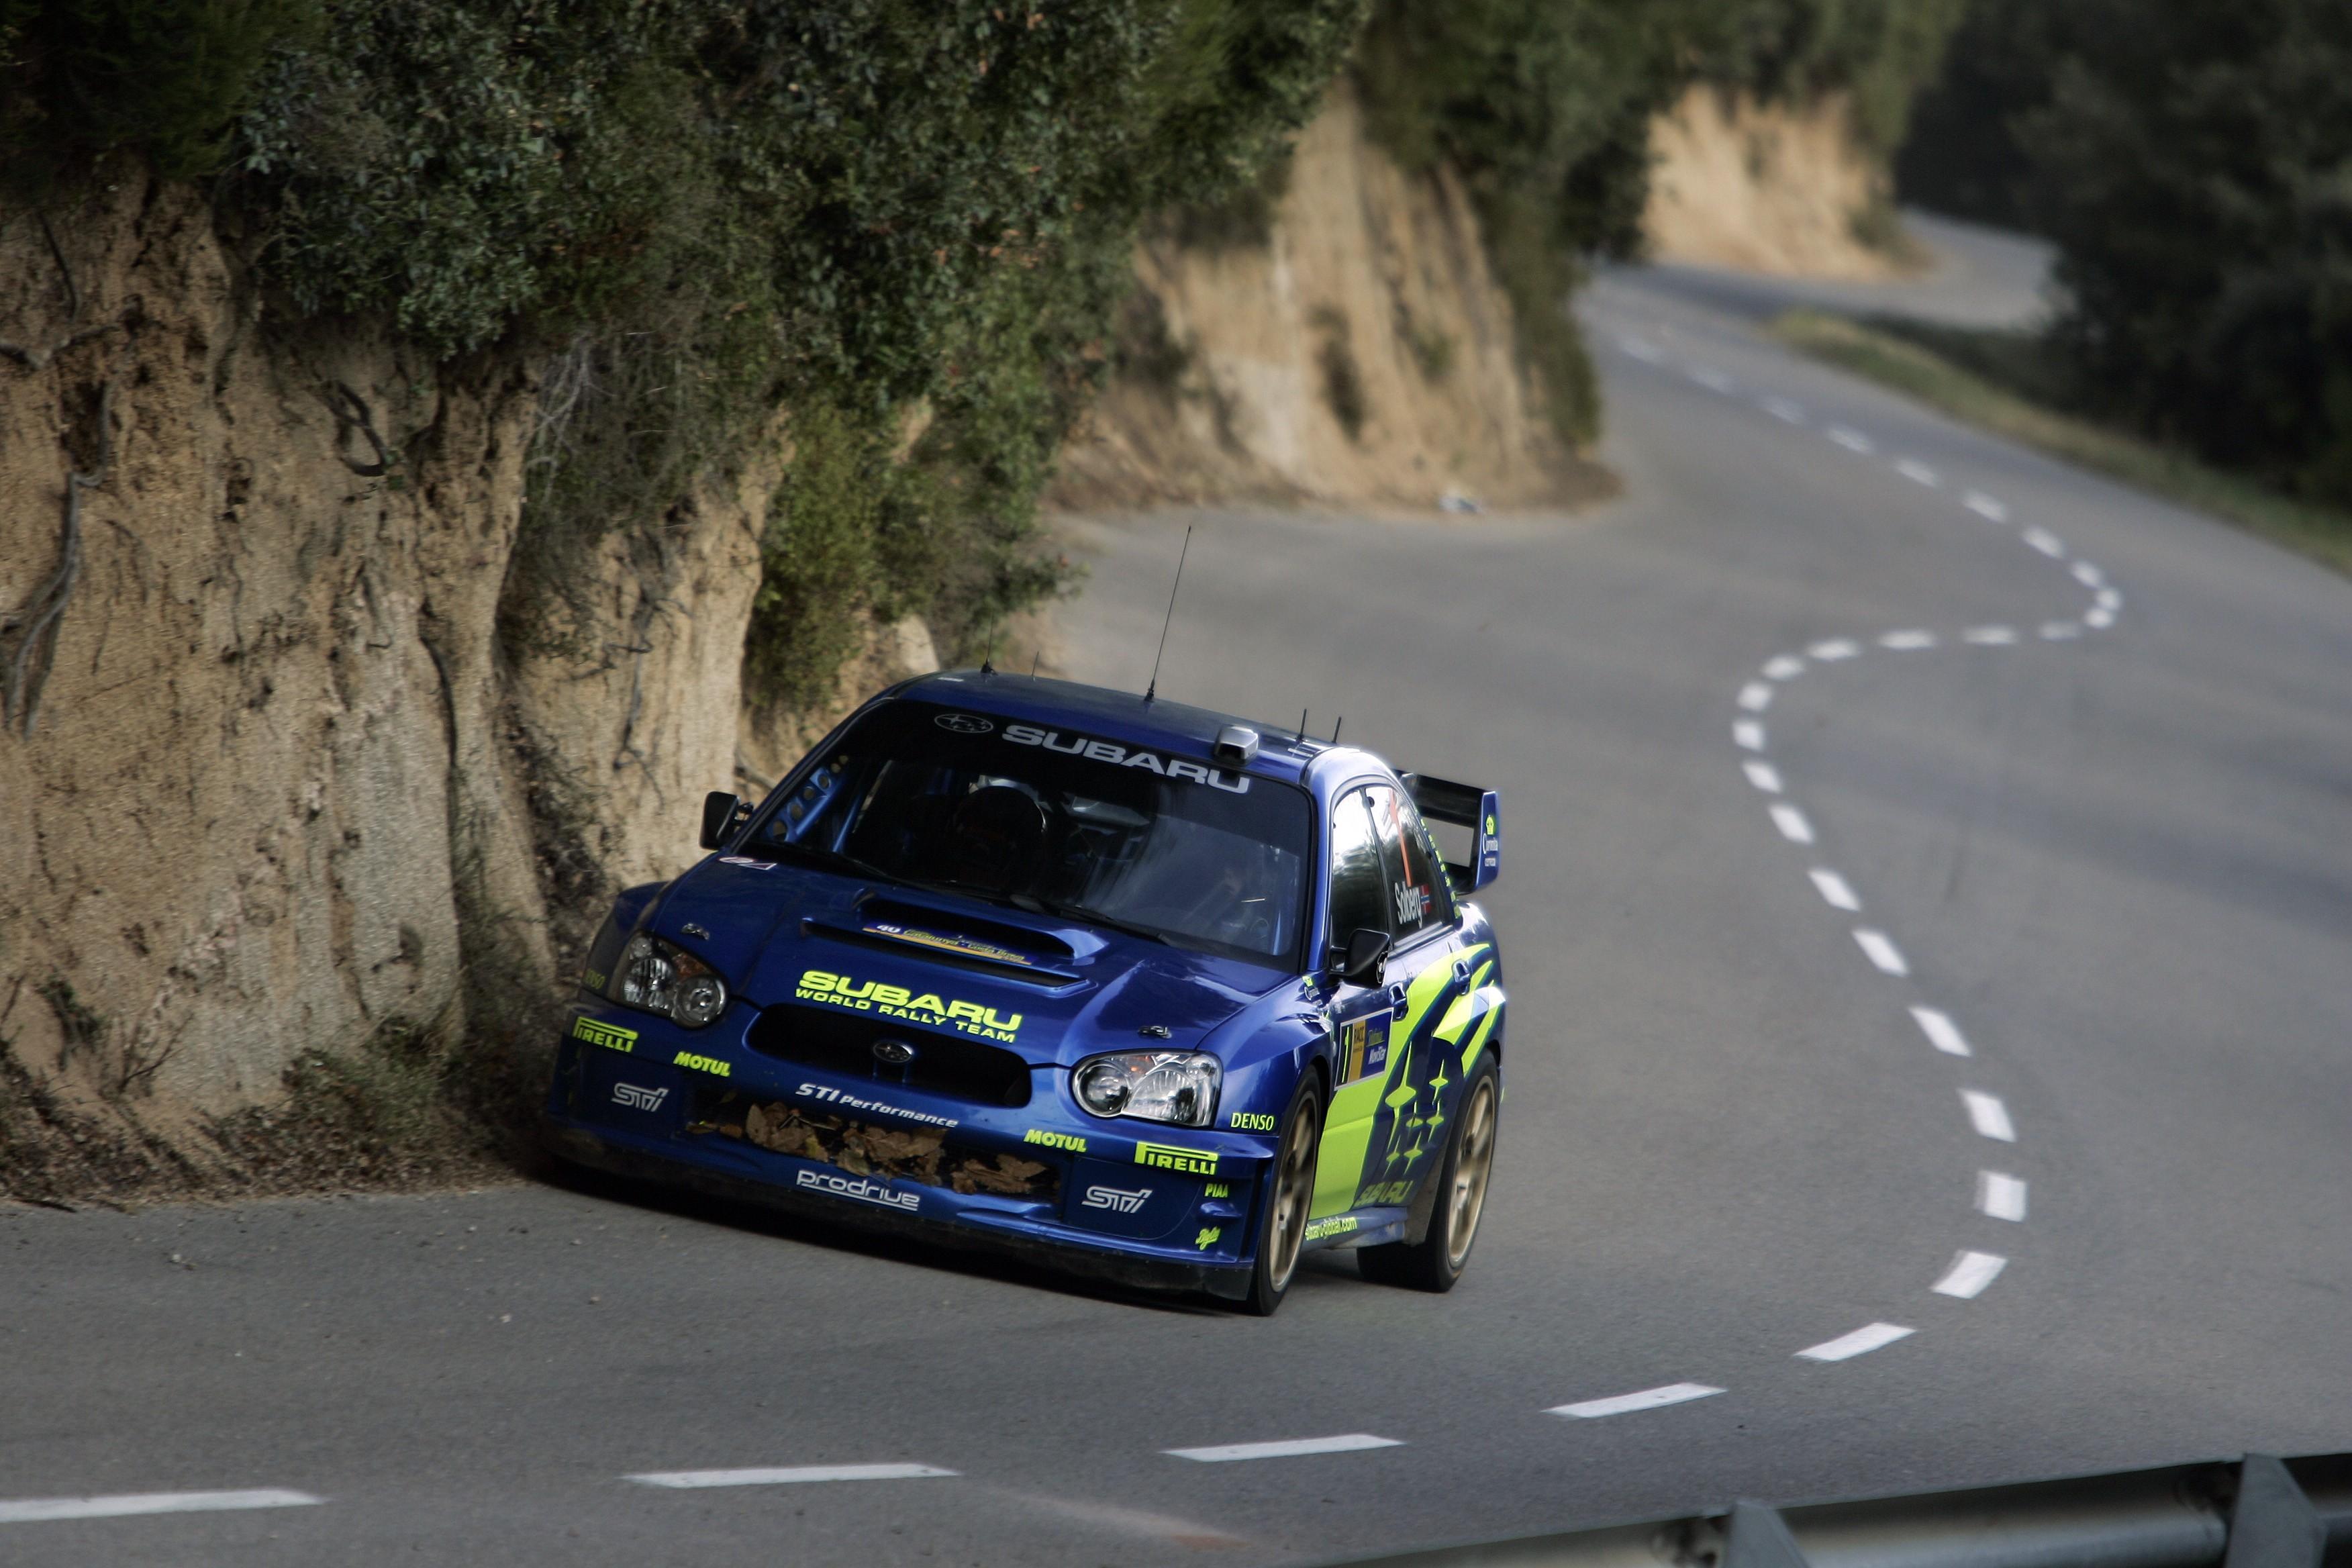 Wallpaper Subaru Impreza Wrx Sti Rally Cars Petter